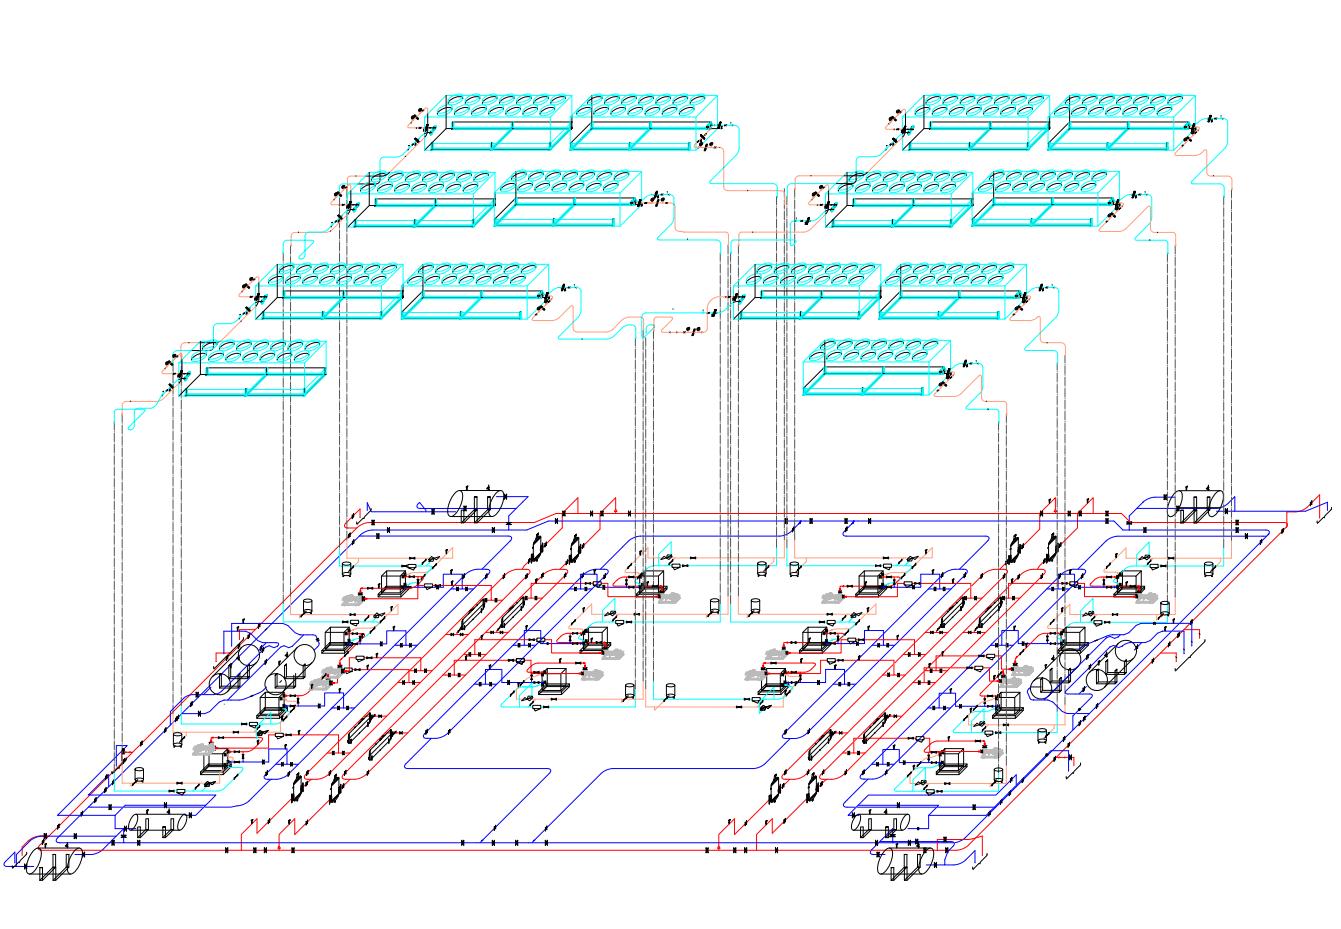 Как создавалась система холодоснабжения дата-центра NORD-4 - 13